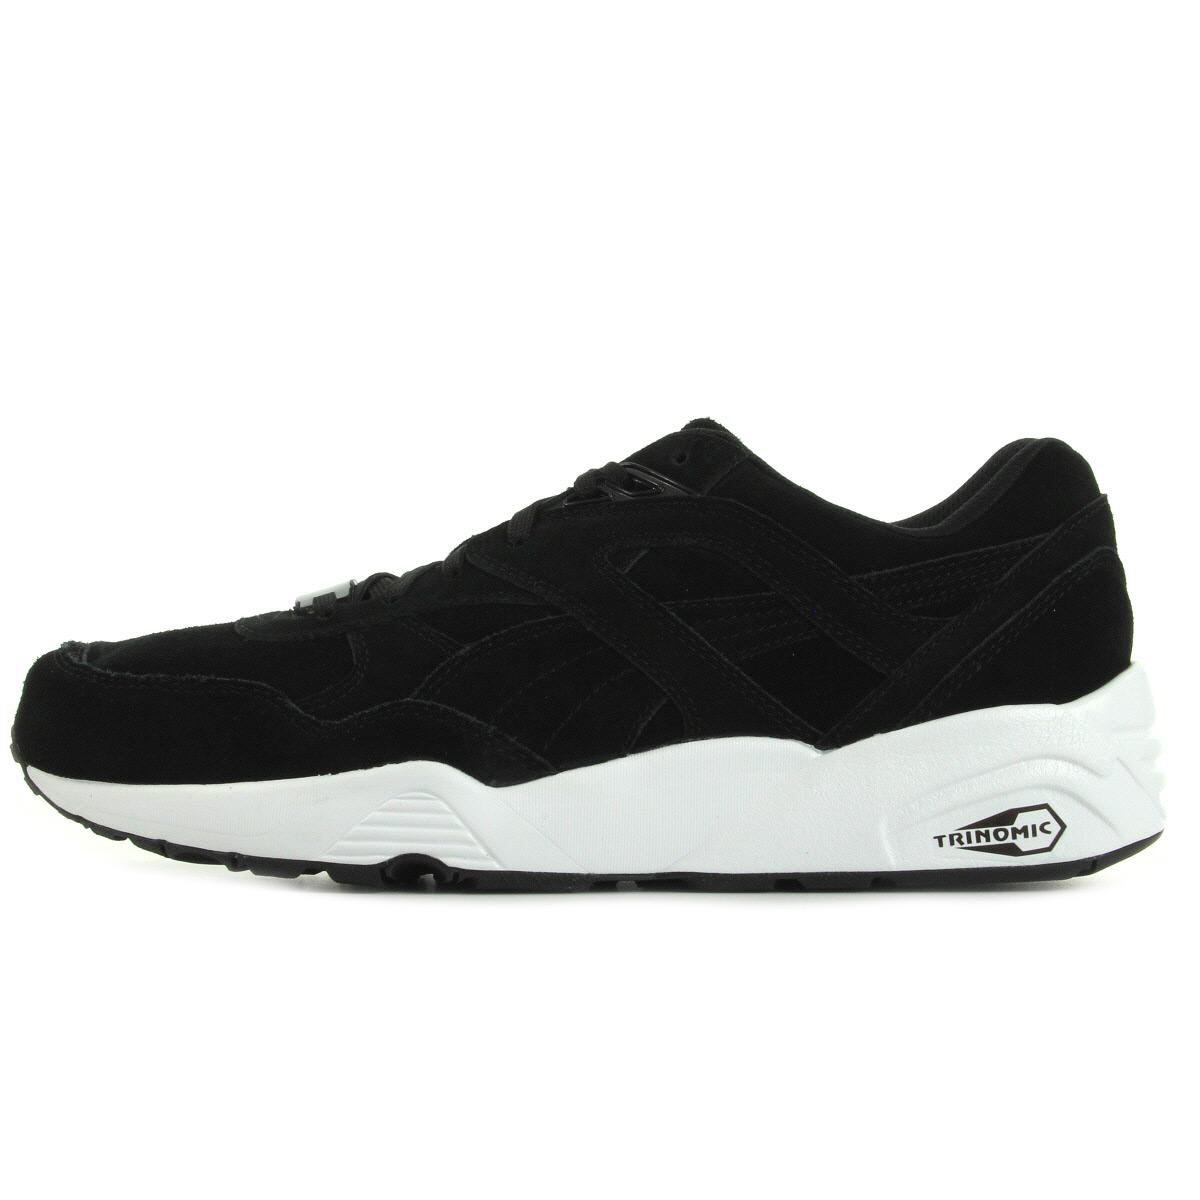 chaussures baskets puma homme r698 allover suede taille noir noire cuir lacets ebay. Black Bedroom Furniture Sets. Home Design Ideas